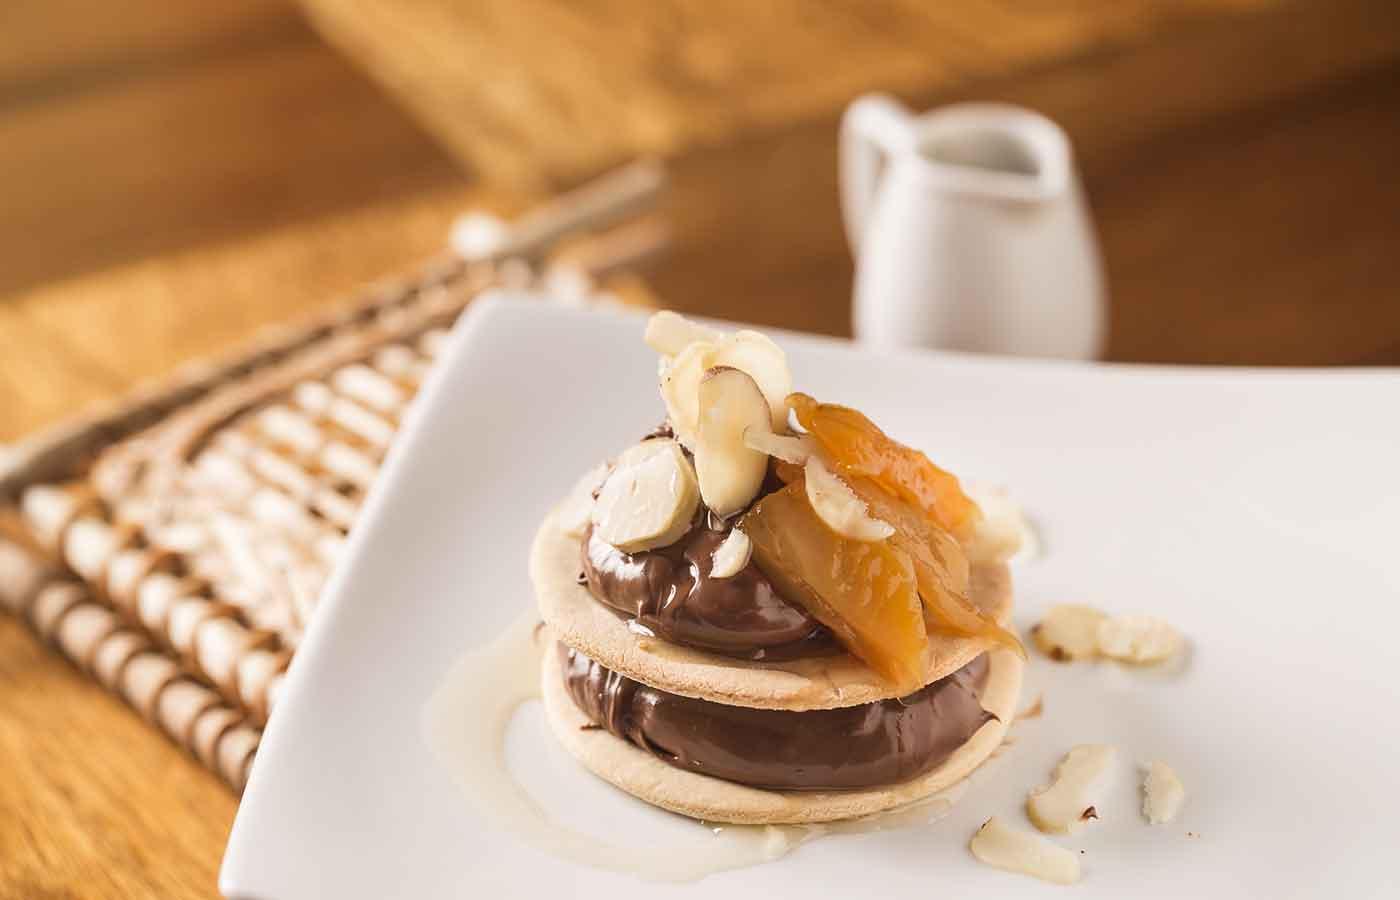 a refined chocolate dessert from Mirante-do-Gaviao in Amazonas, Brazil